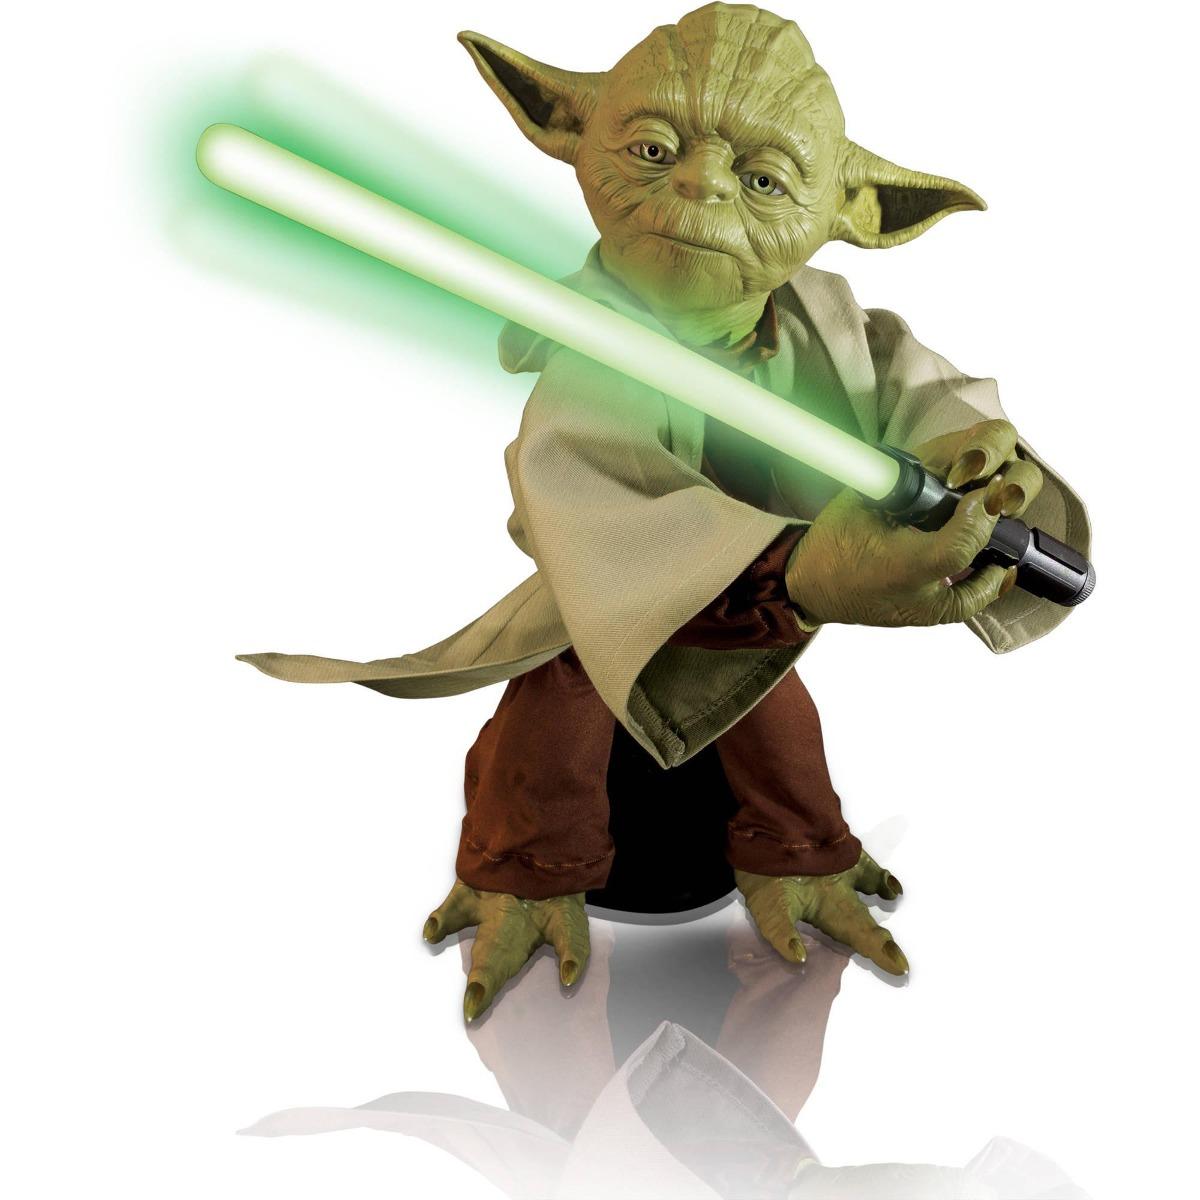 Yoda Character Design : Star wars mestre jedi yoda master legendary realista vivo